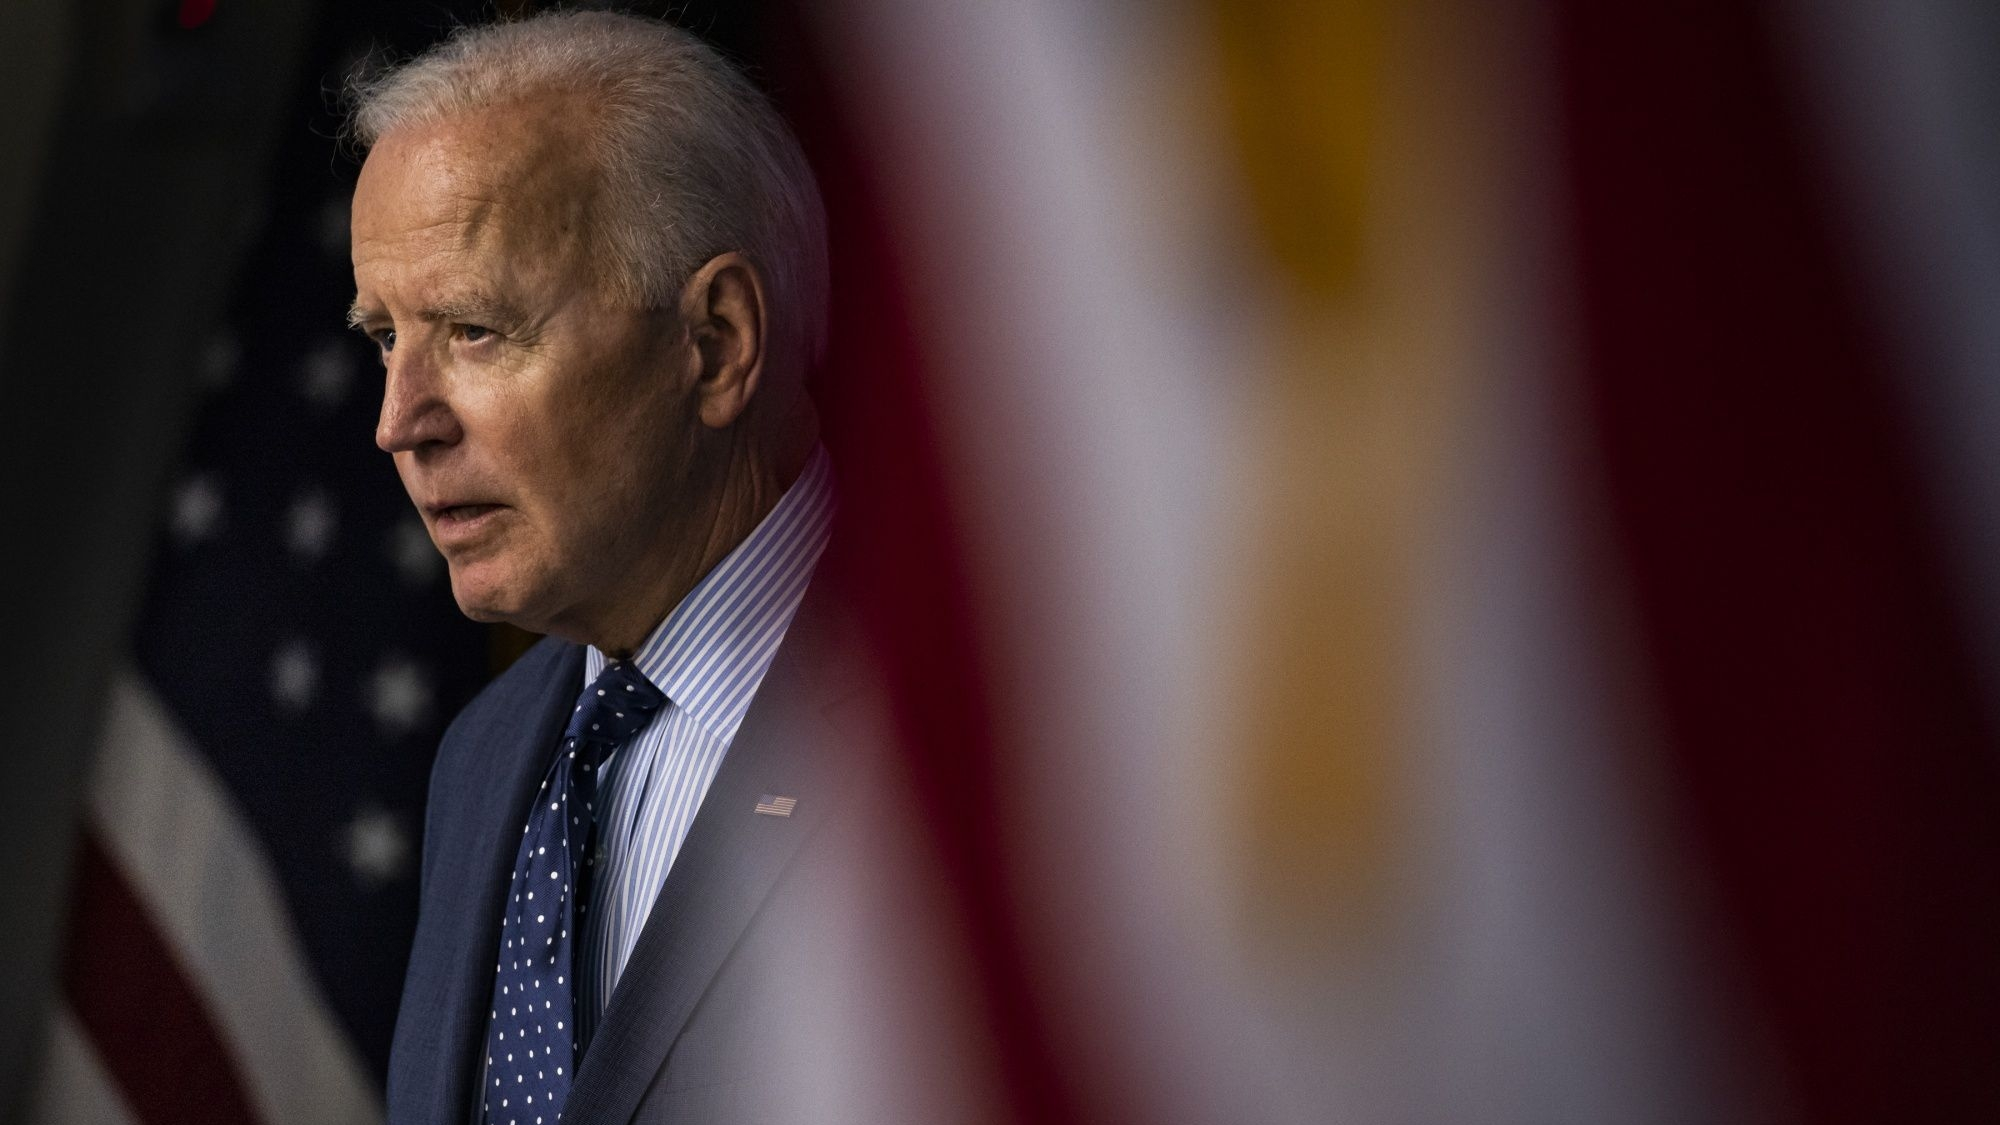 Joe Biden's credibility has been shredded in Afghanistan